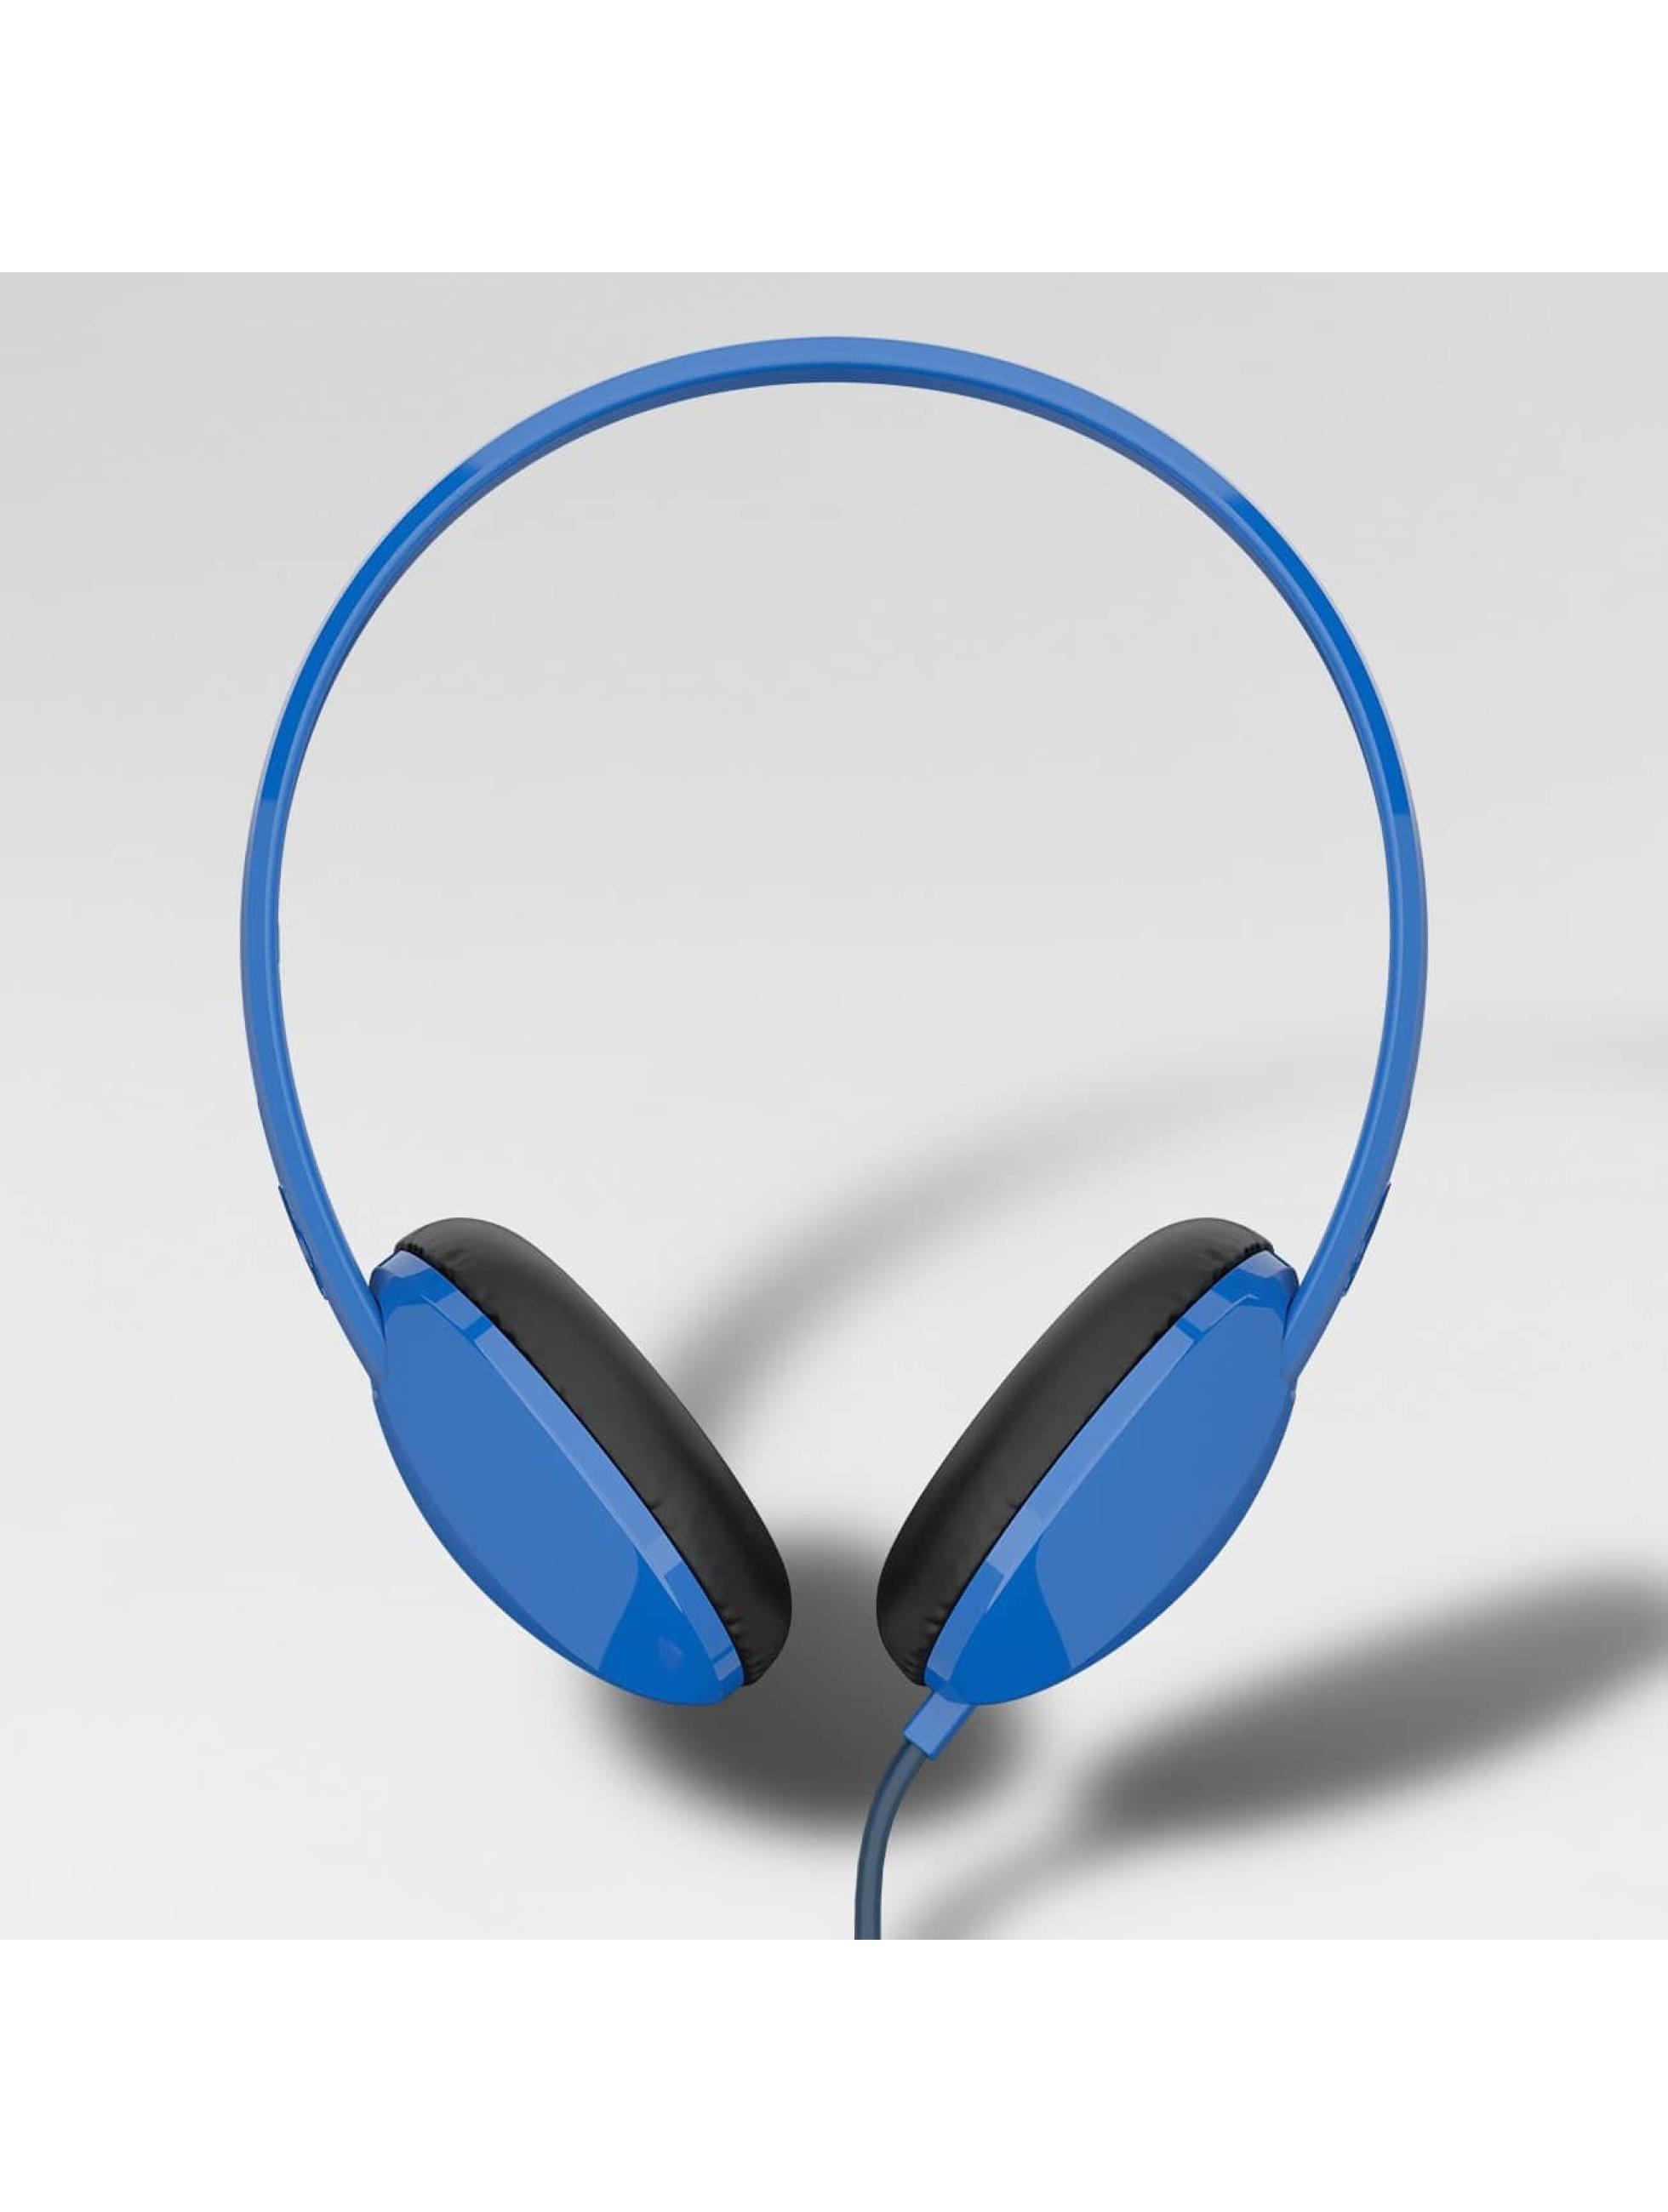 Skullcandy Sluchátka Stim Mic 1 On Ear modrý